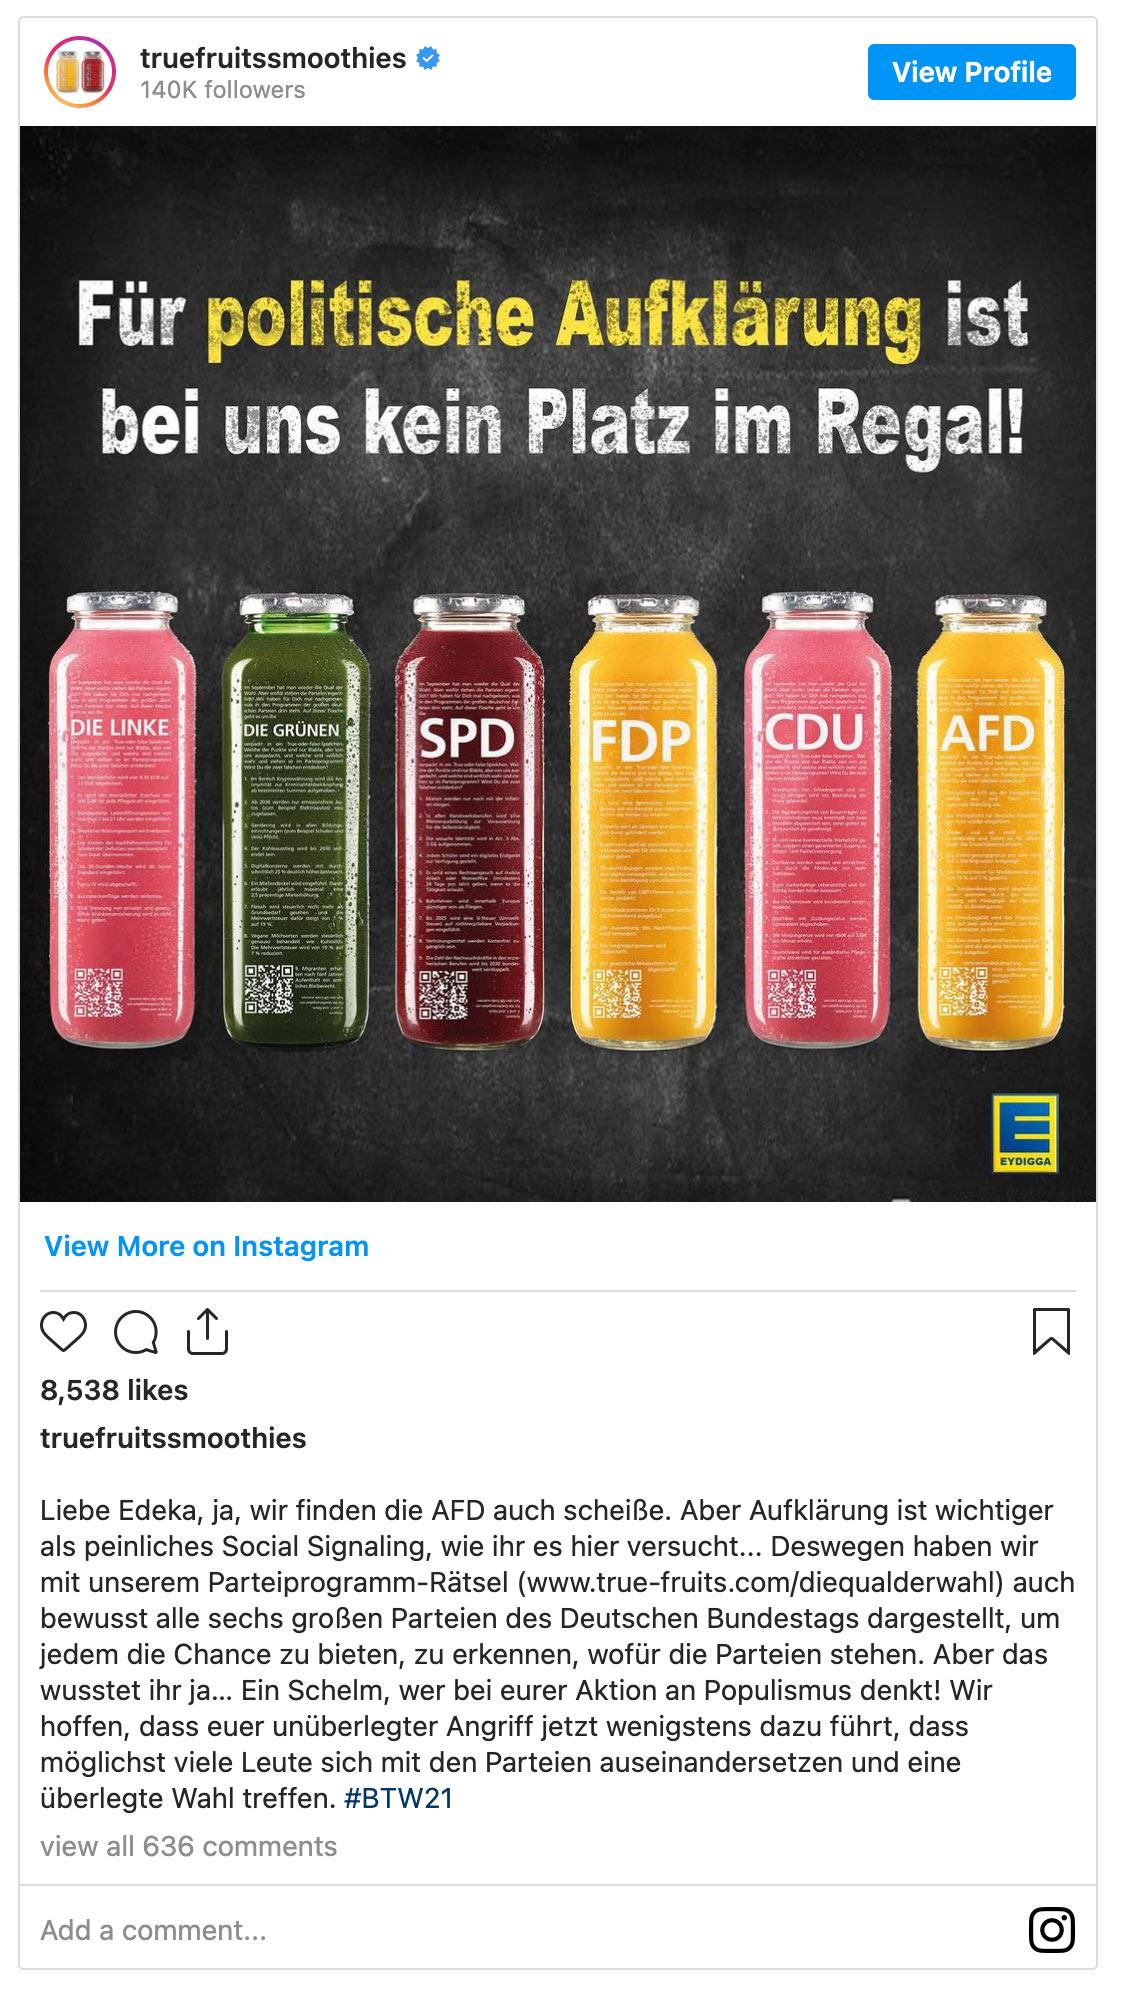 wwf socialmedia fail 4 - True Fruits - EDEKA und WWF - So geht Social Media (nicht)